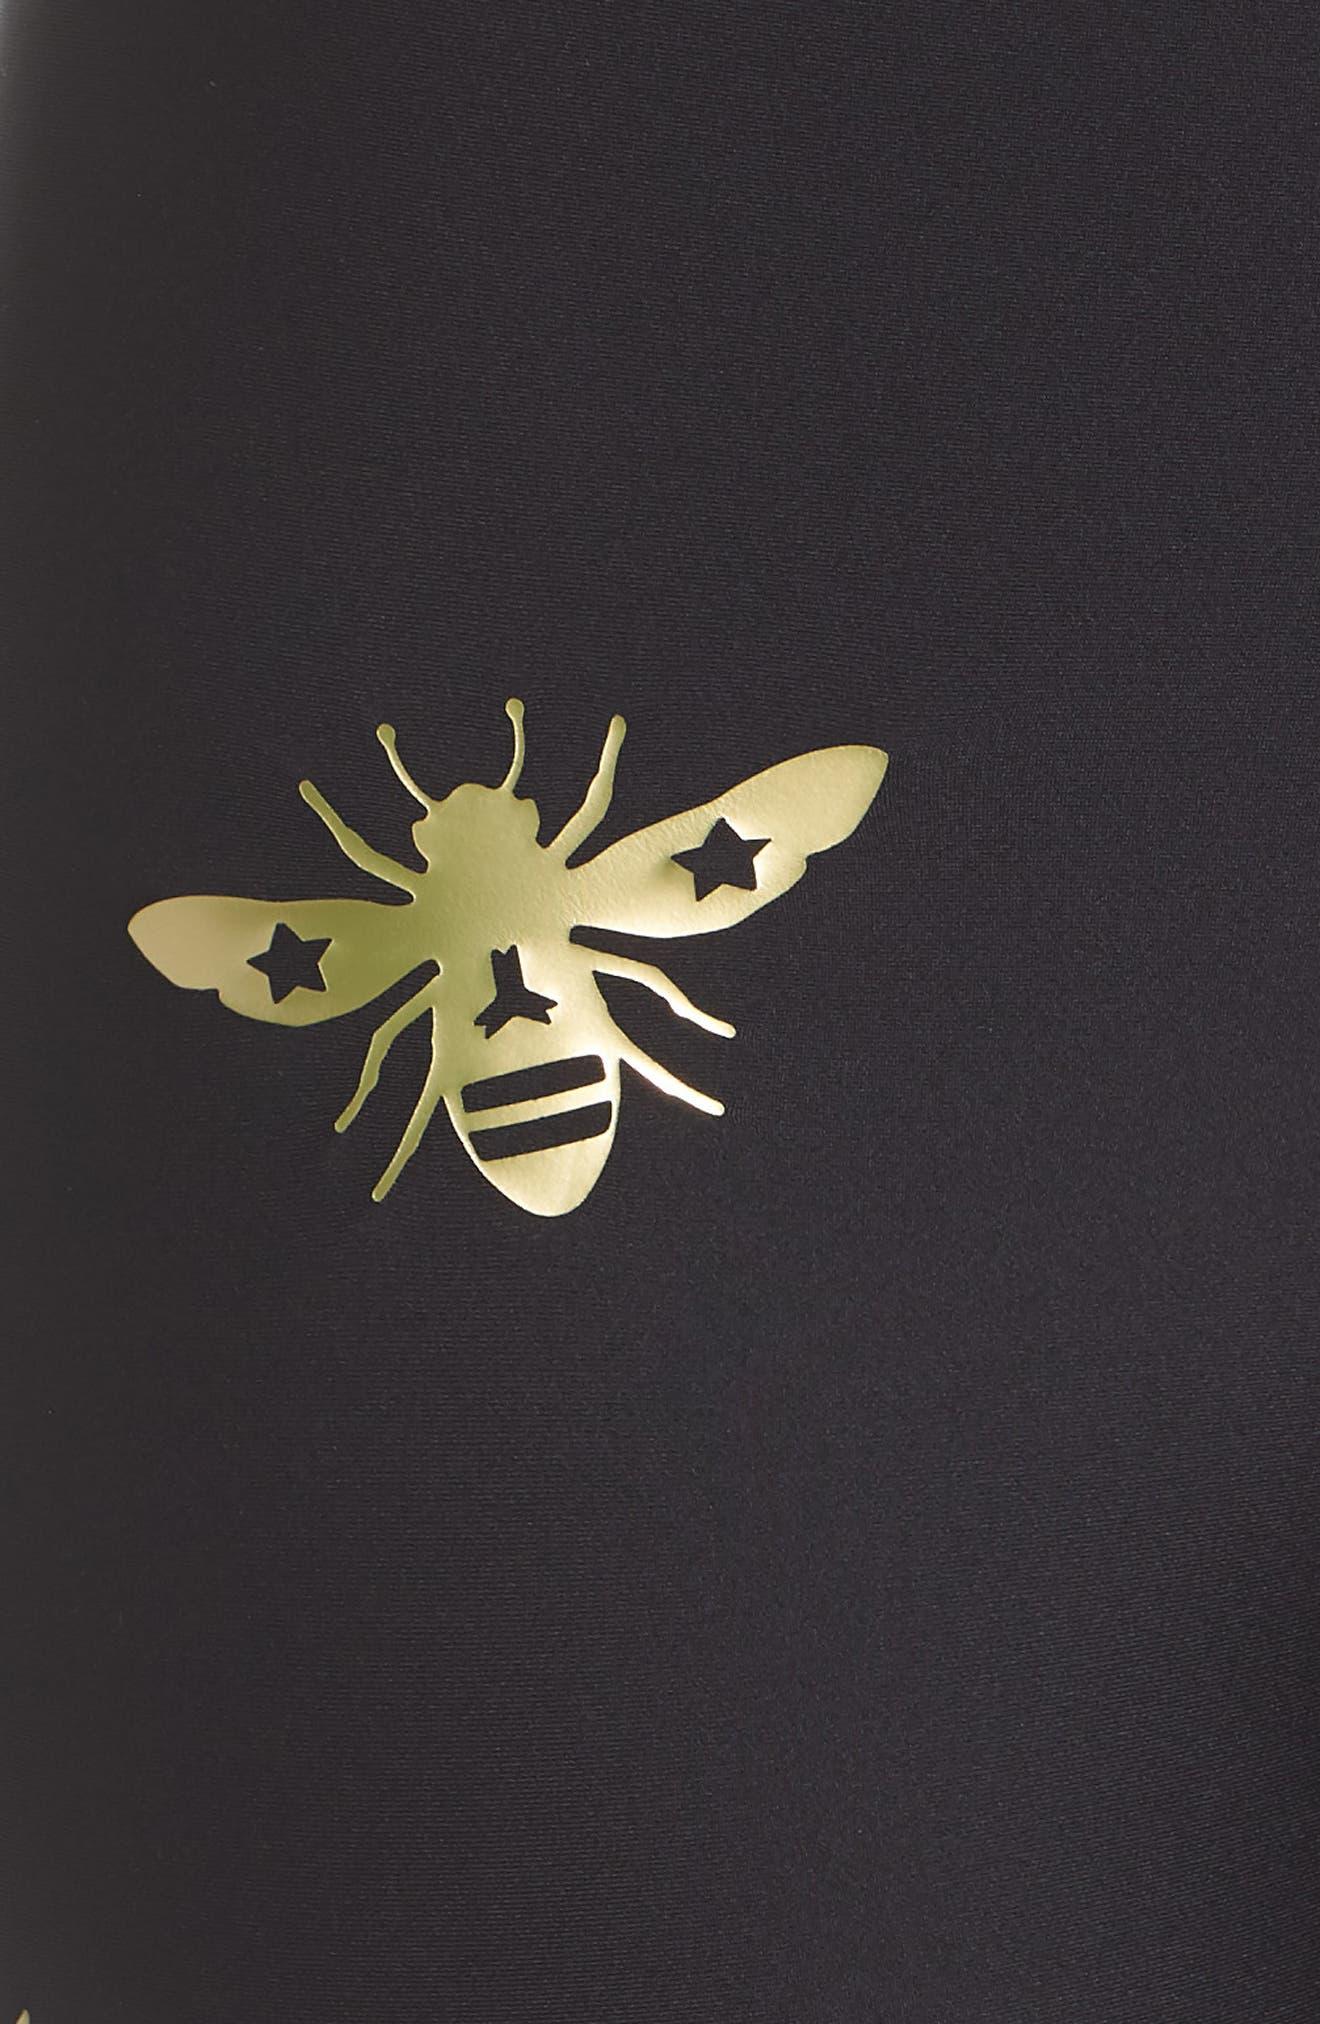 Ultra Bee Leggings,                             Alternate thumbnail 5, color,                             Nero/ Gold